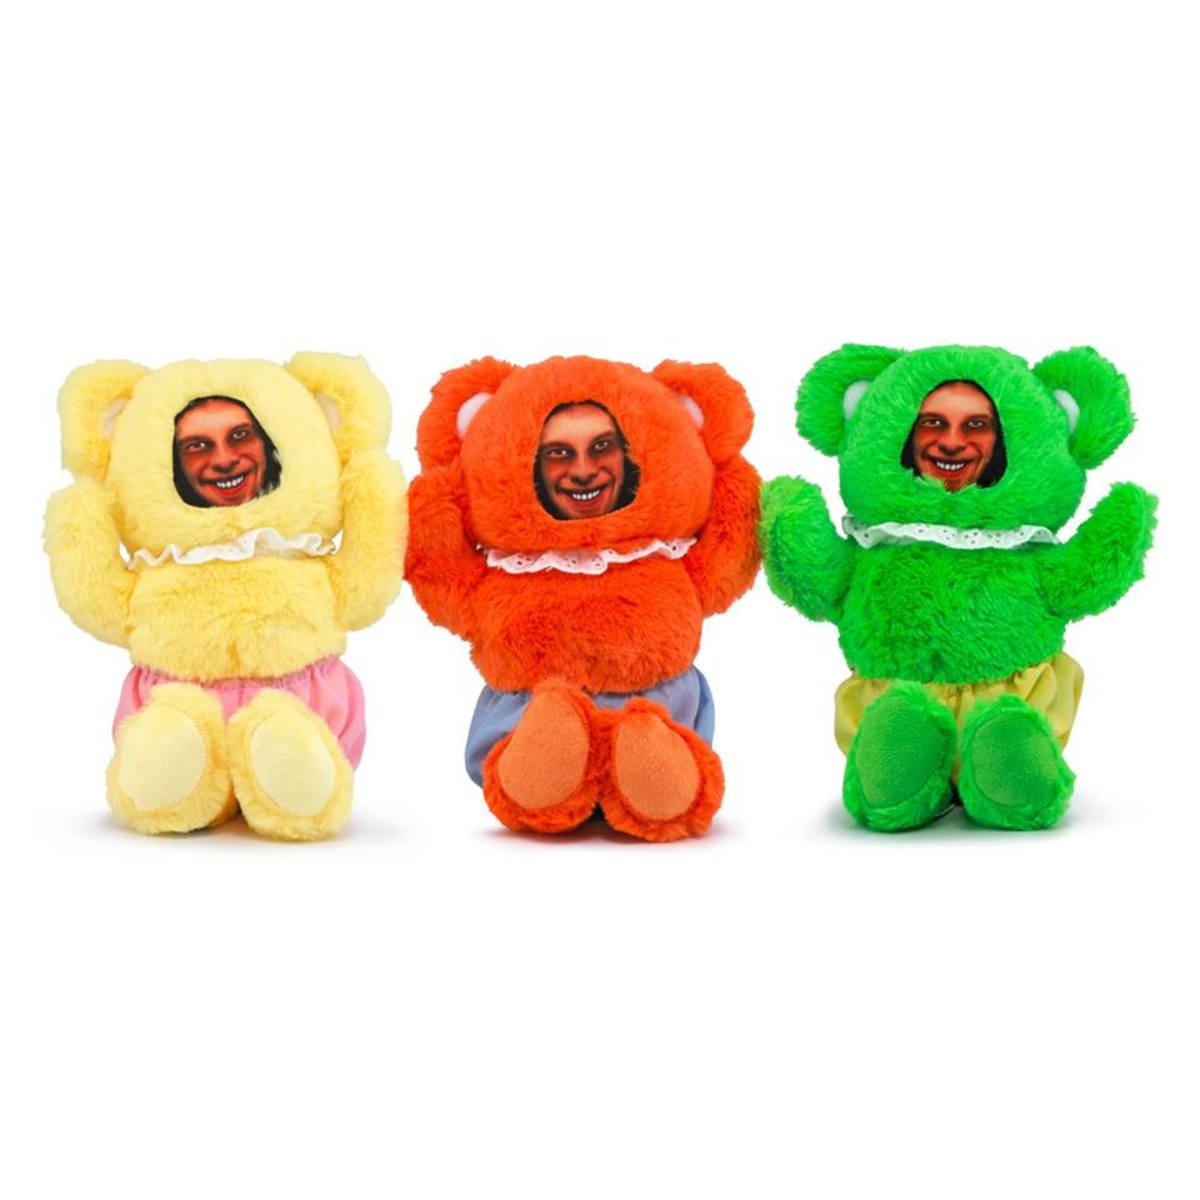 Aphex twin teddy bear